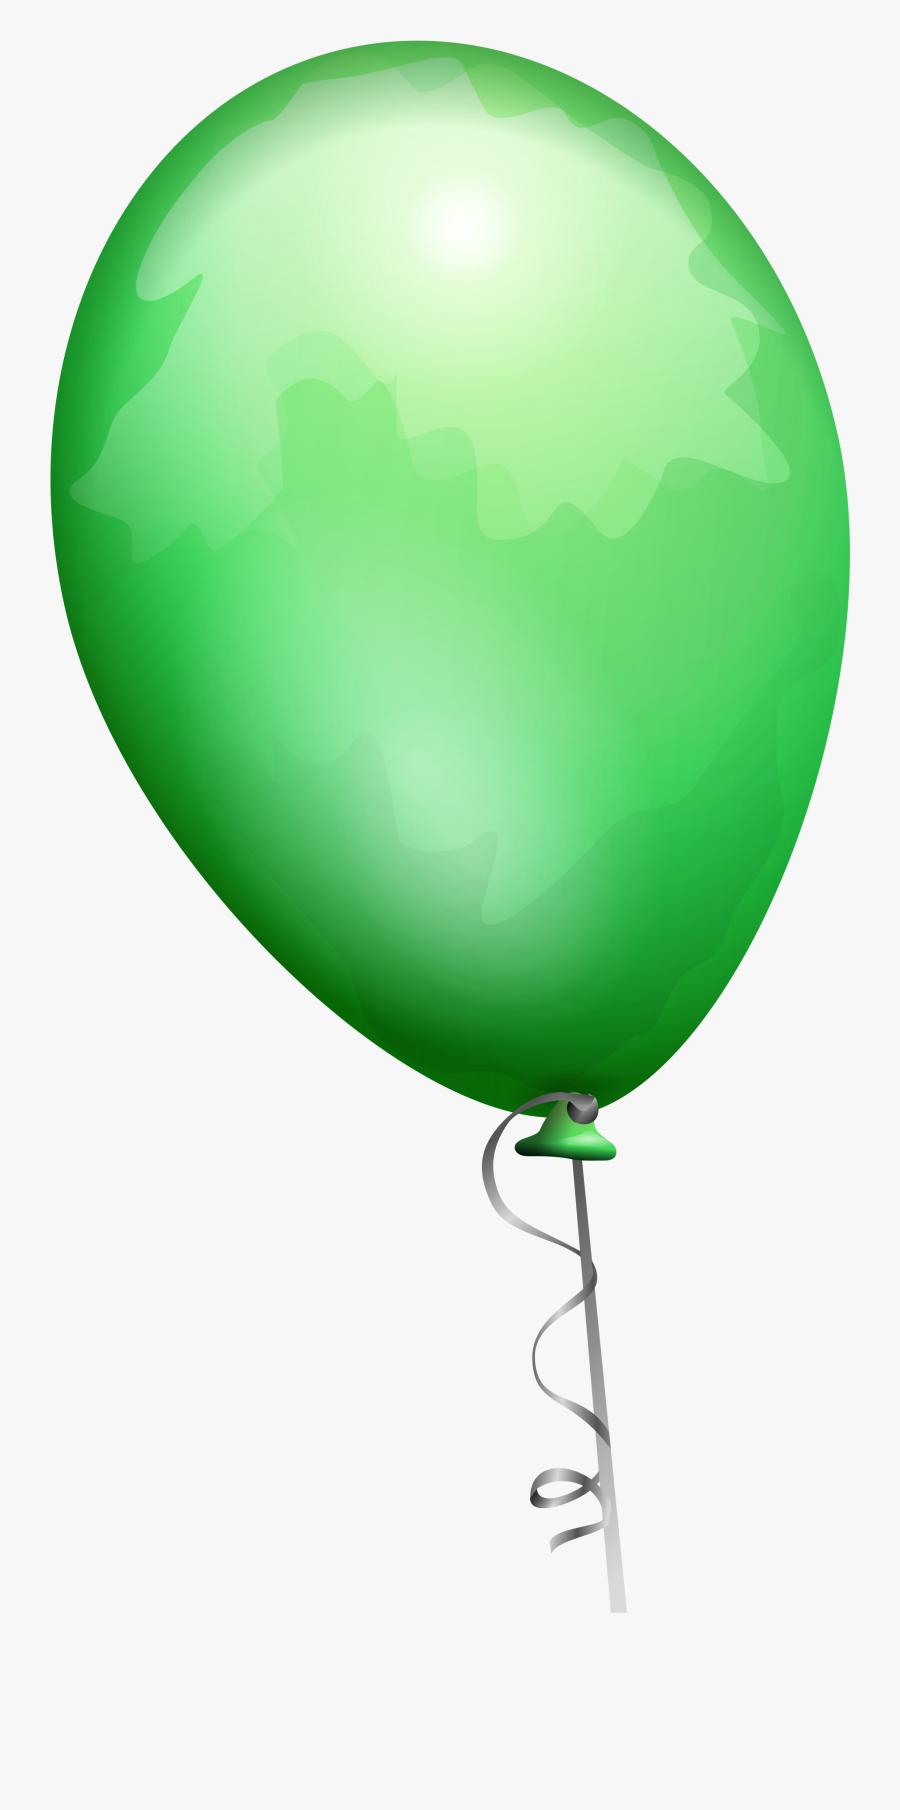 Ballon Clipart Green - Balloon Clip Art, Transparent Clipart